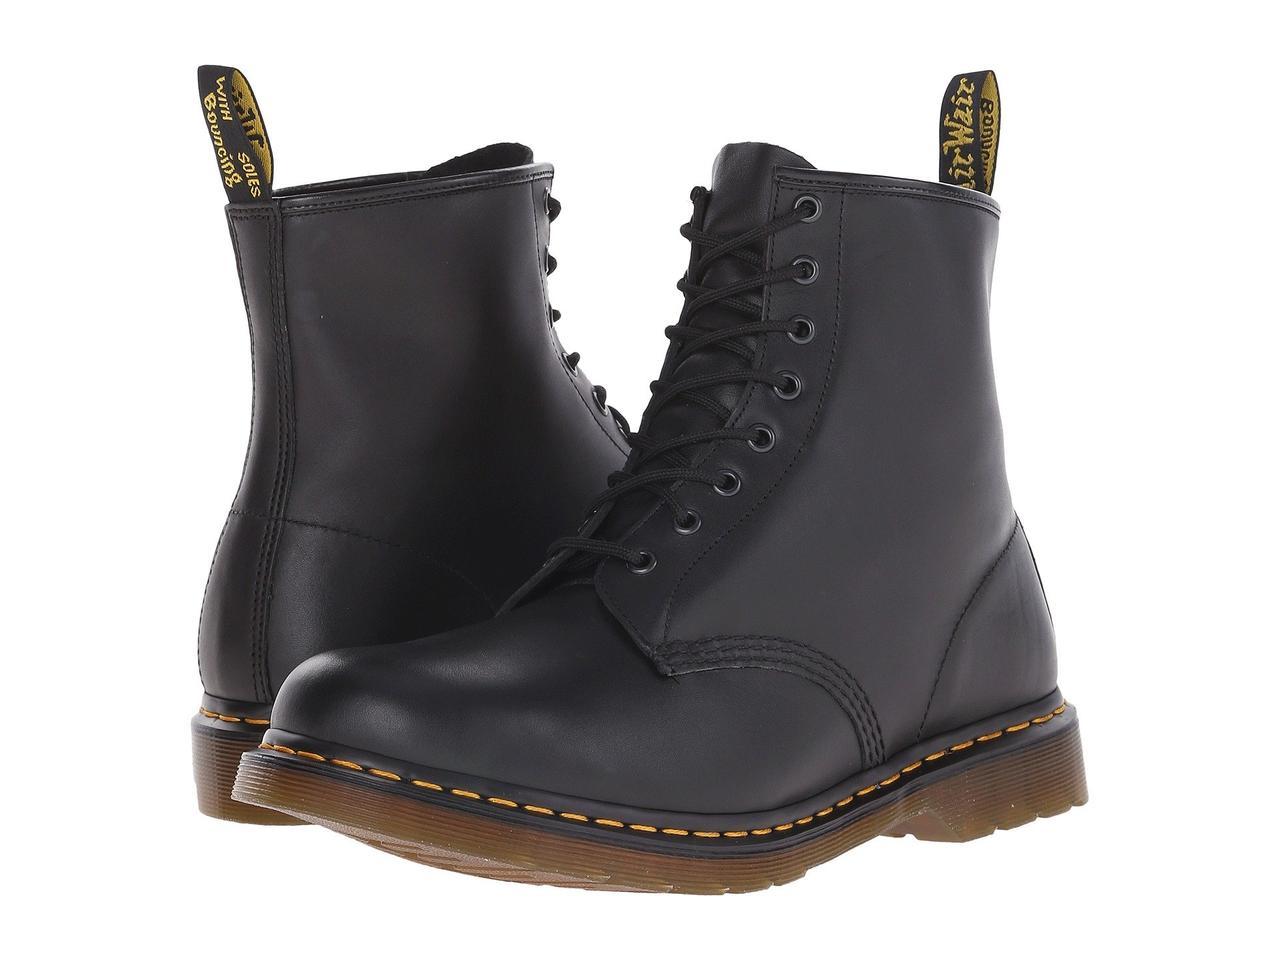 5244e5db Ботинки/Сапоги (Оригинал) Dr. Martens 1460 Black Nappa Leather - TopUSA